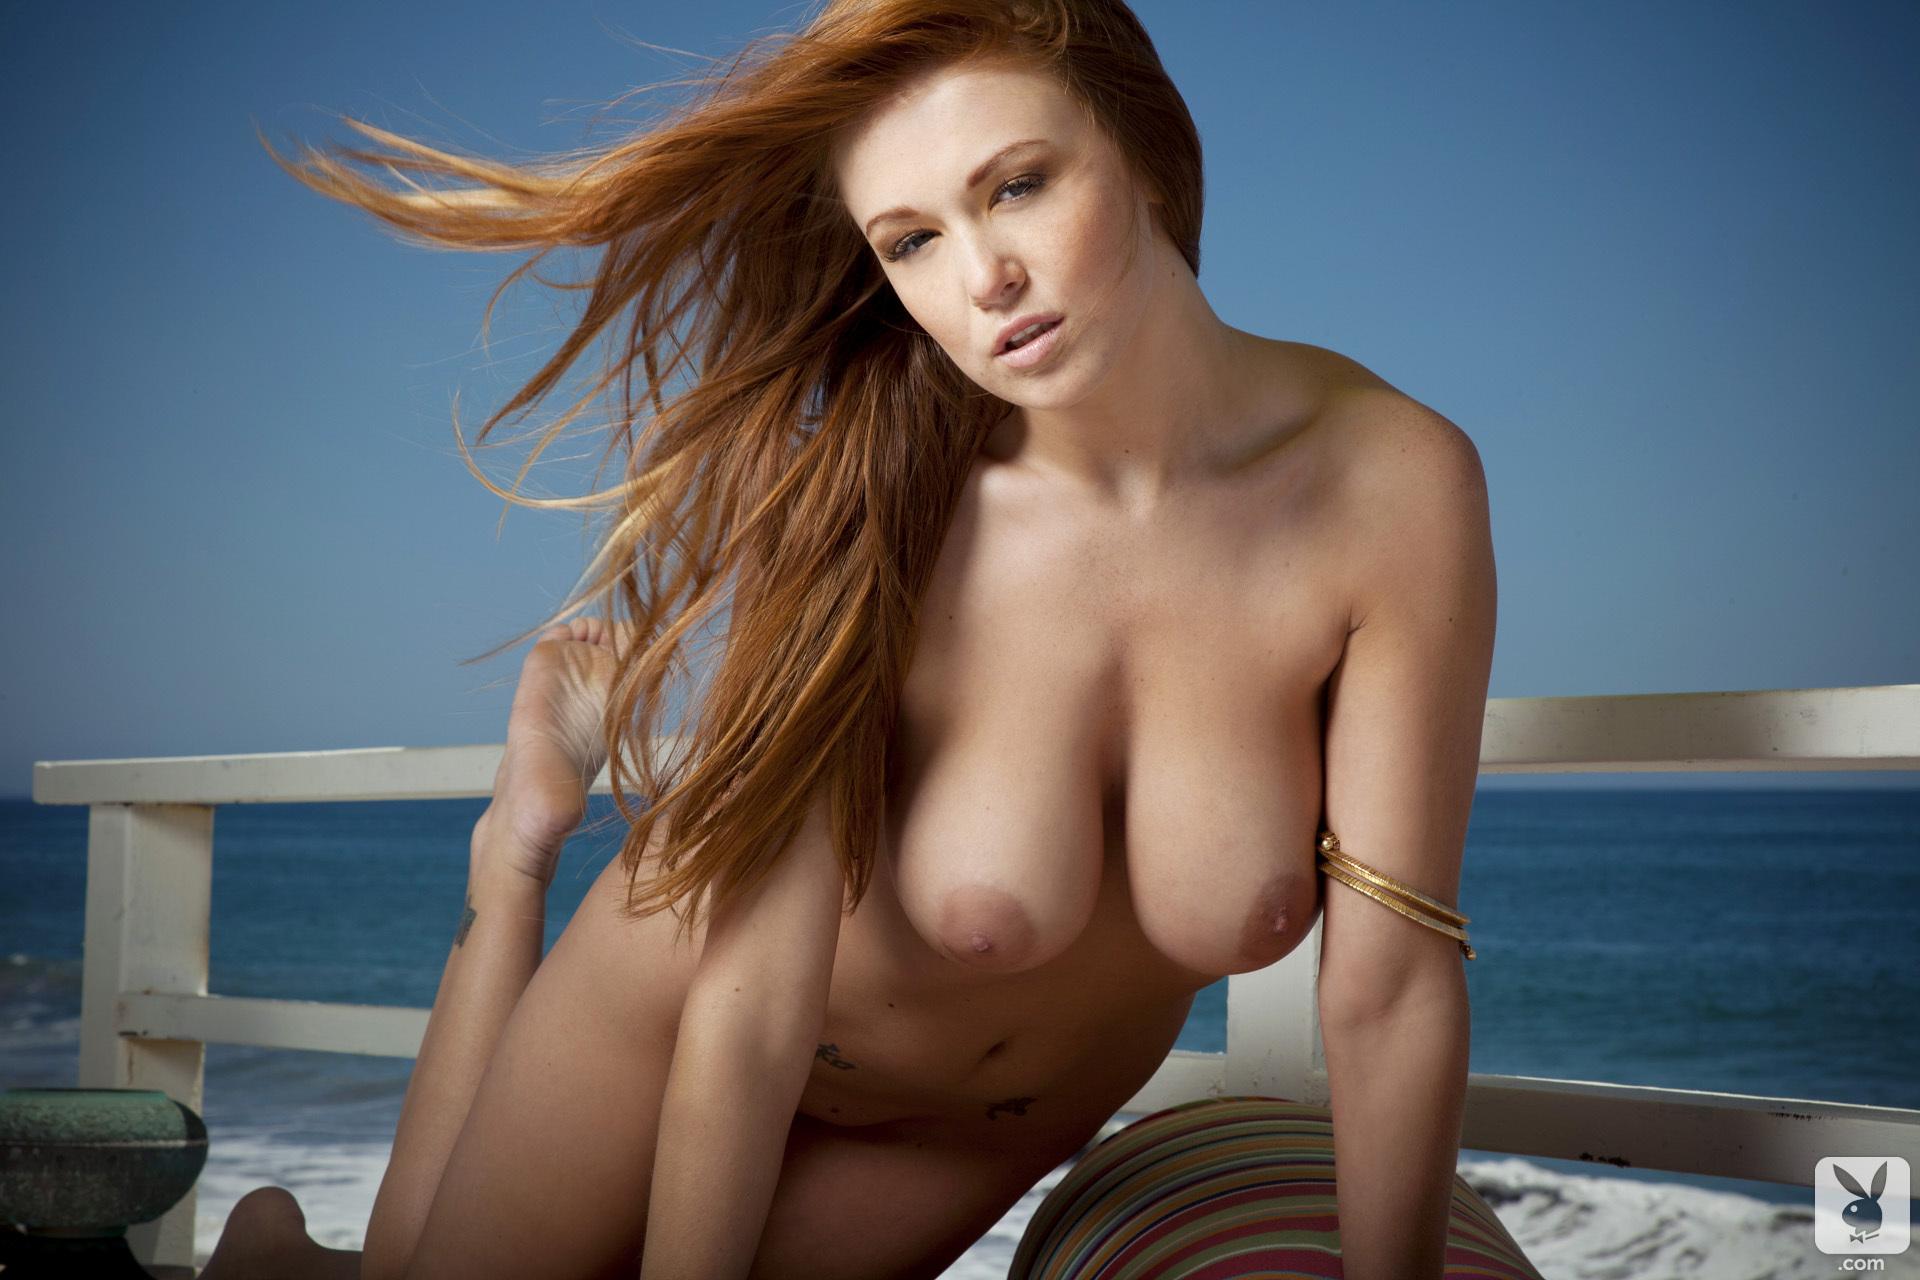 leanna-decker-bikini-boobs-redhead-seaside-playboy-22